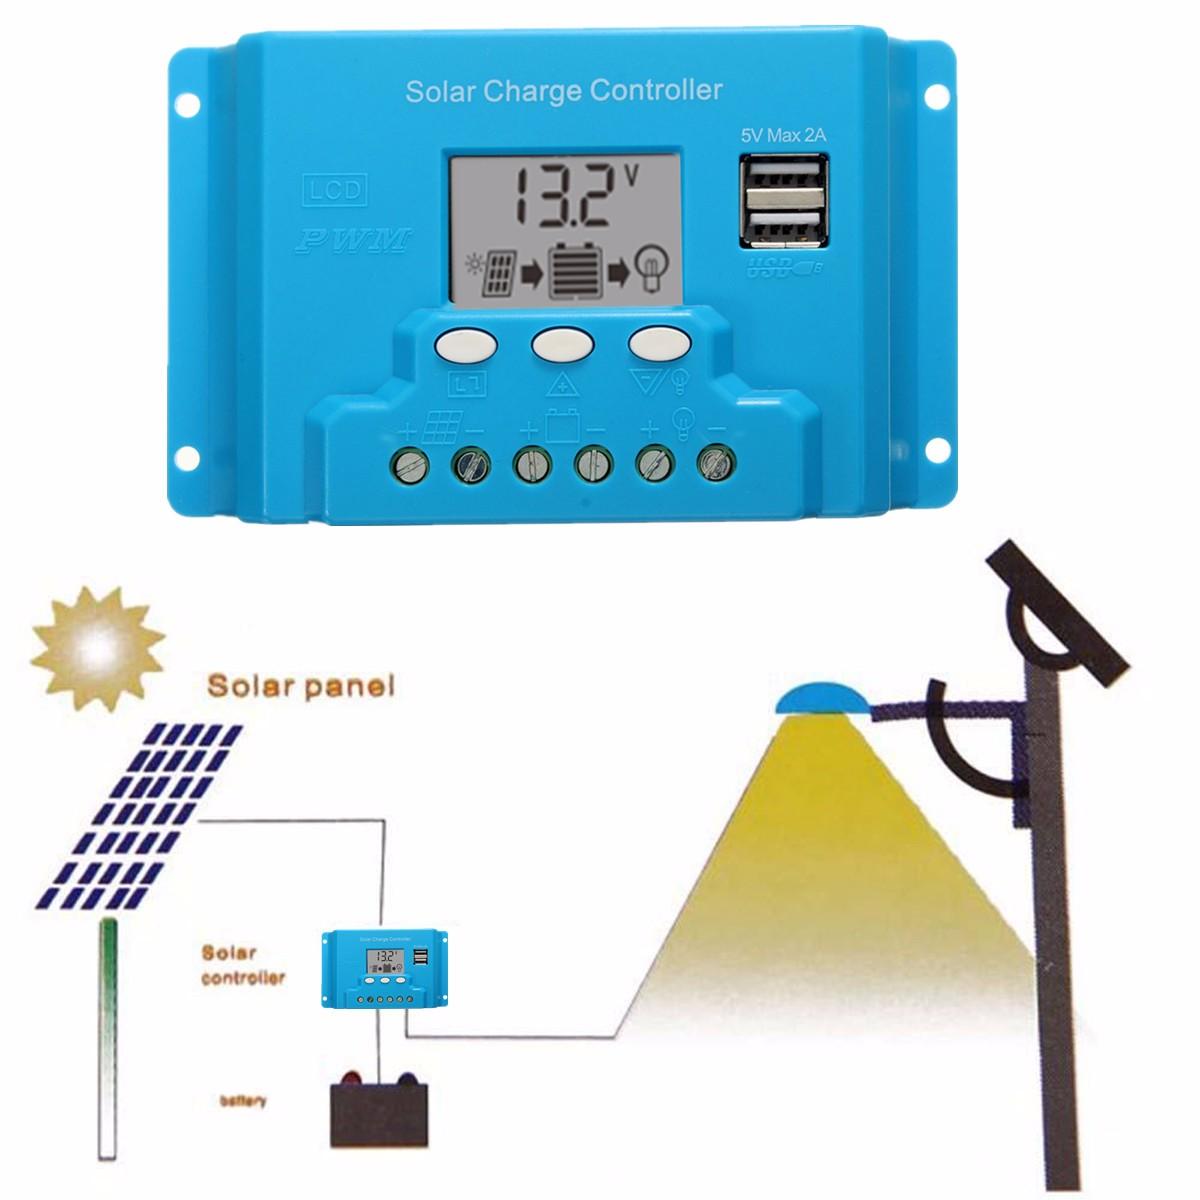 10a 20a 30a Lcd Pwm Solar Panel Charge Controller Battery Regulator 12v24v Automatic Art Of Circuits 4eff0d4b B179 2936 888b 9fa75364892e